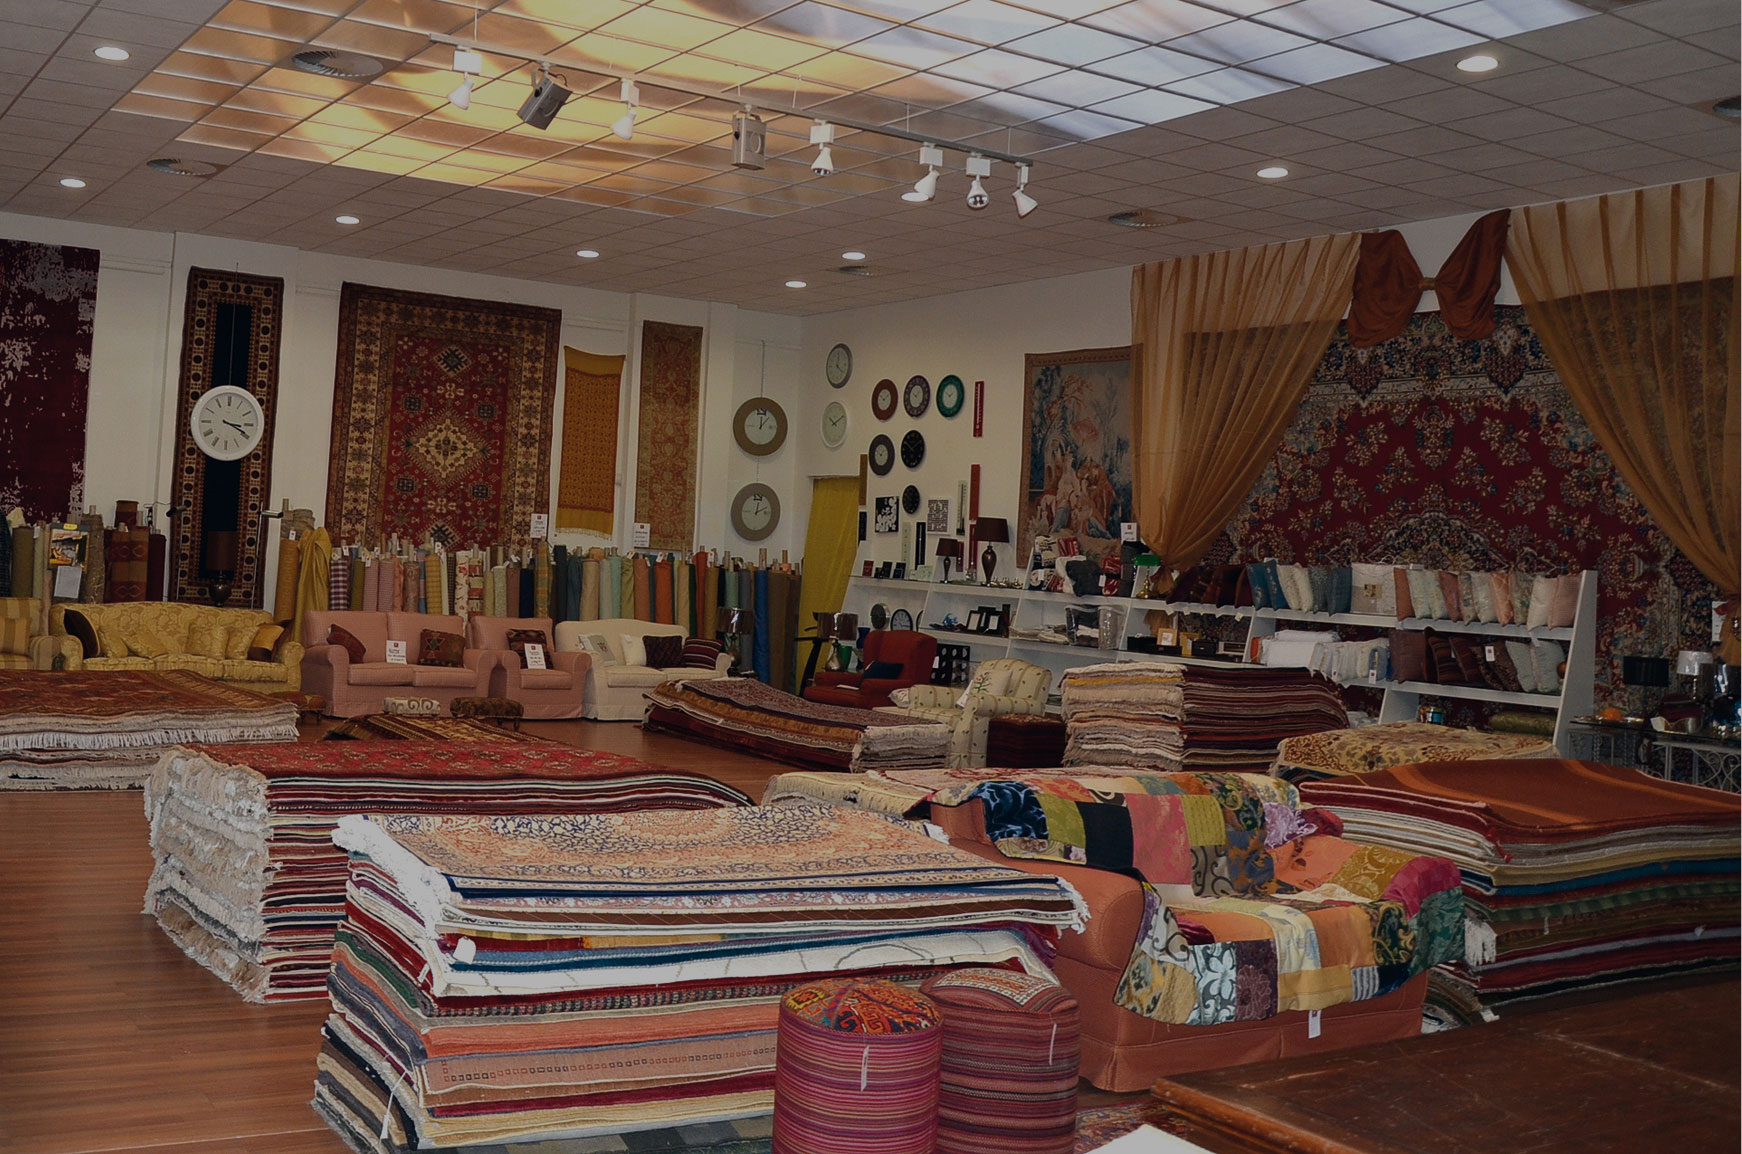 Negozi divani milano background with negozi divani milano for Negozi mobili milano